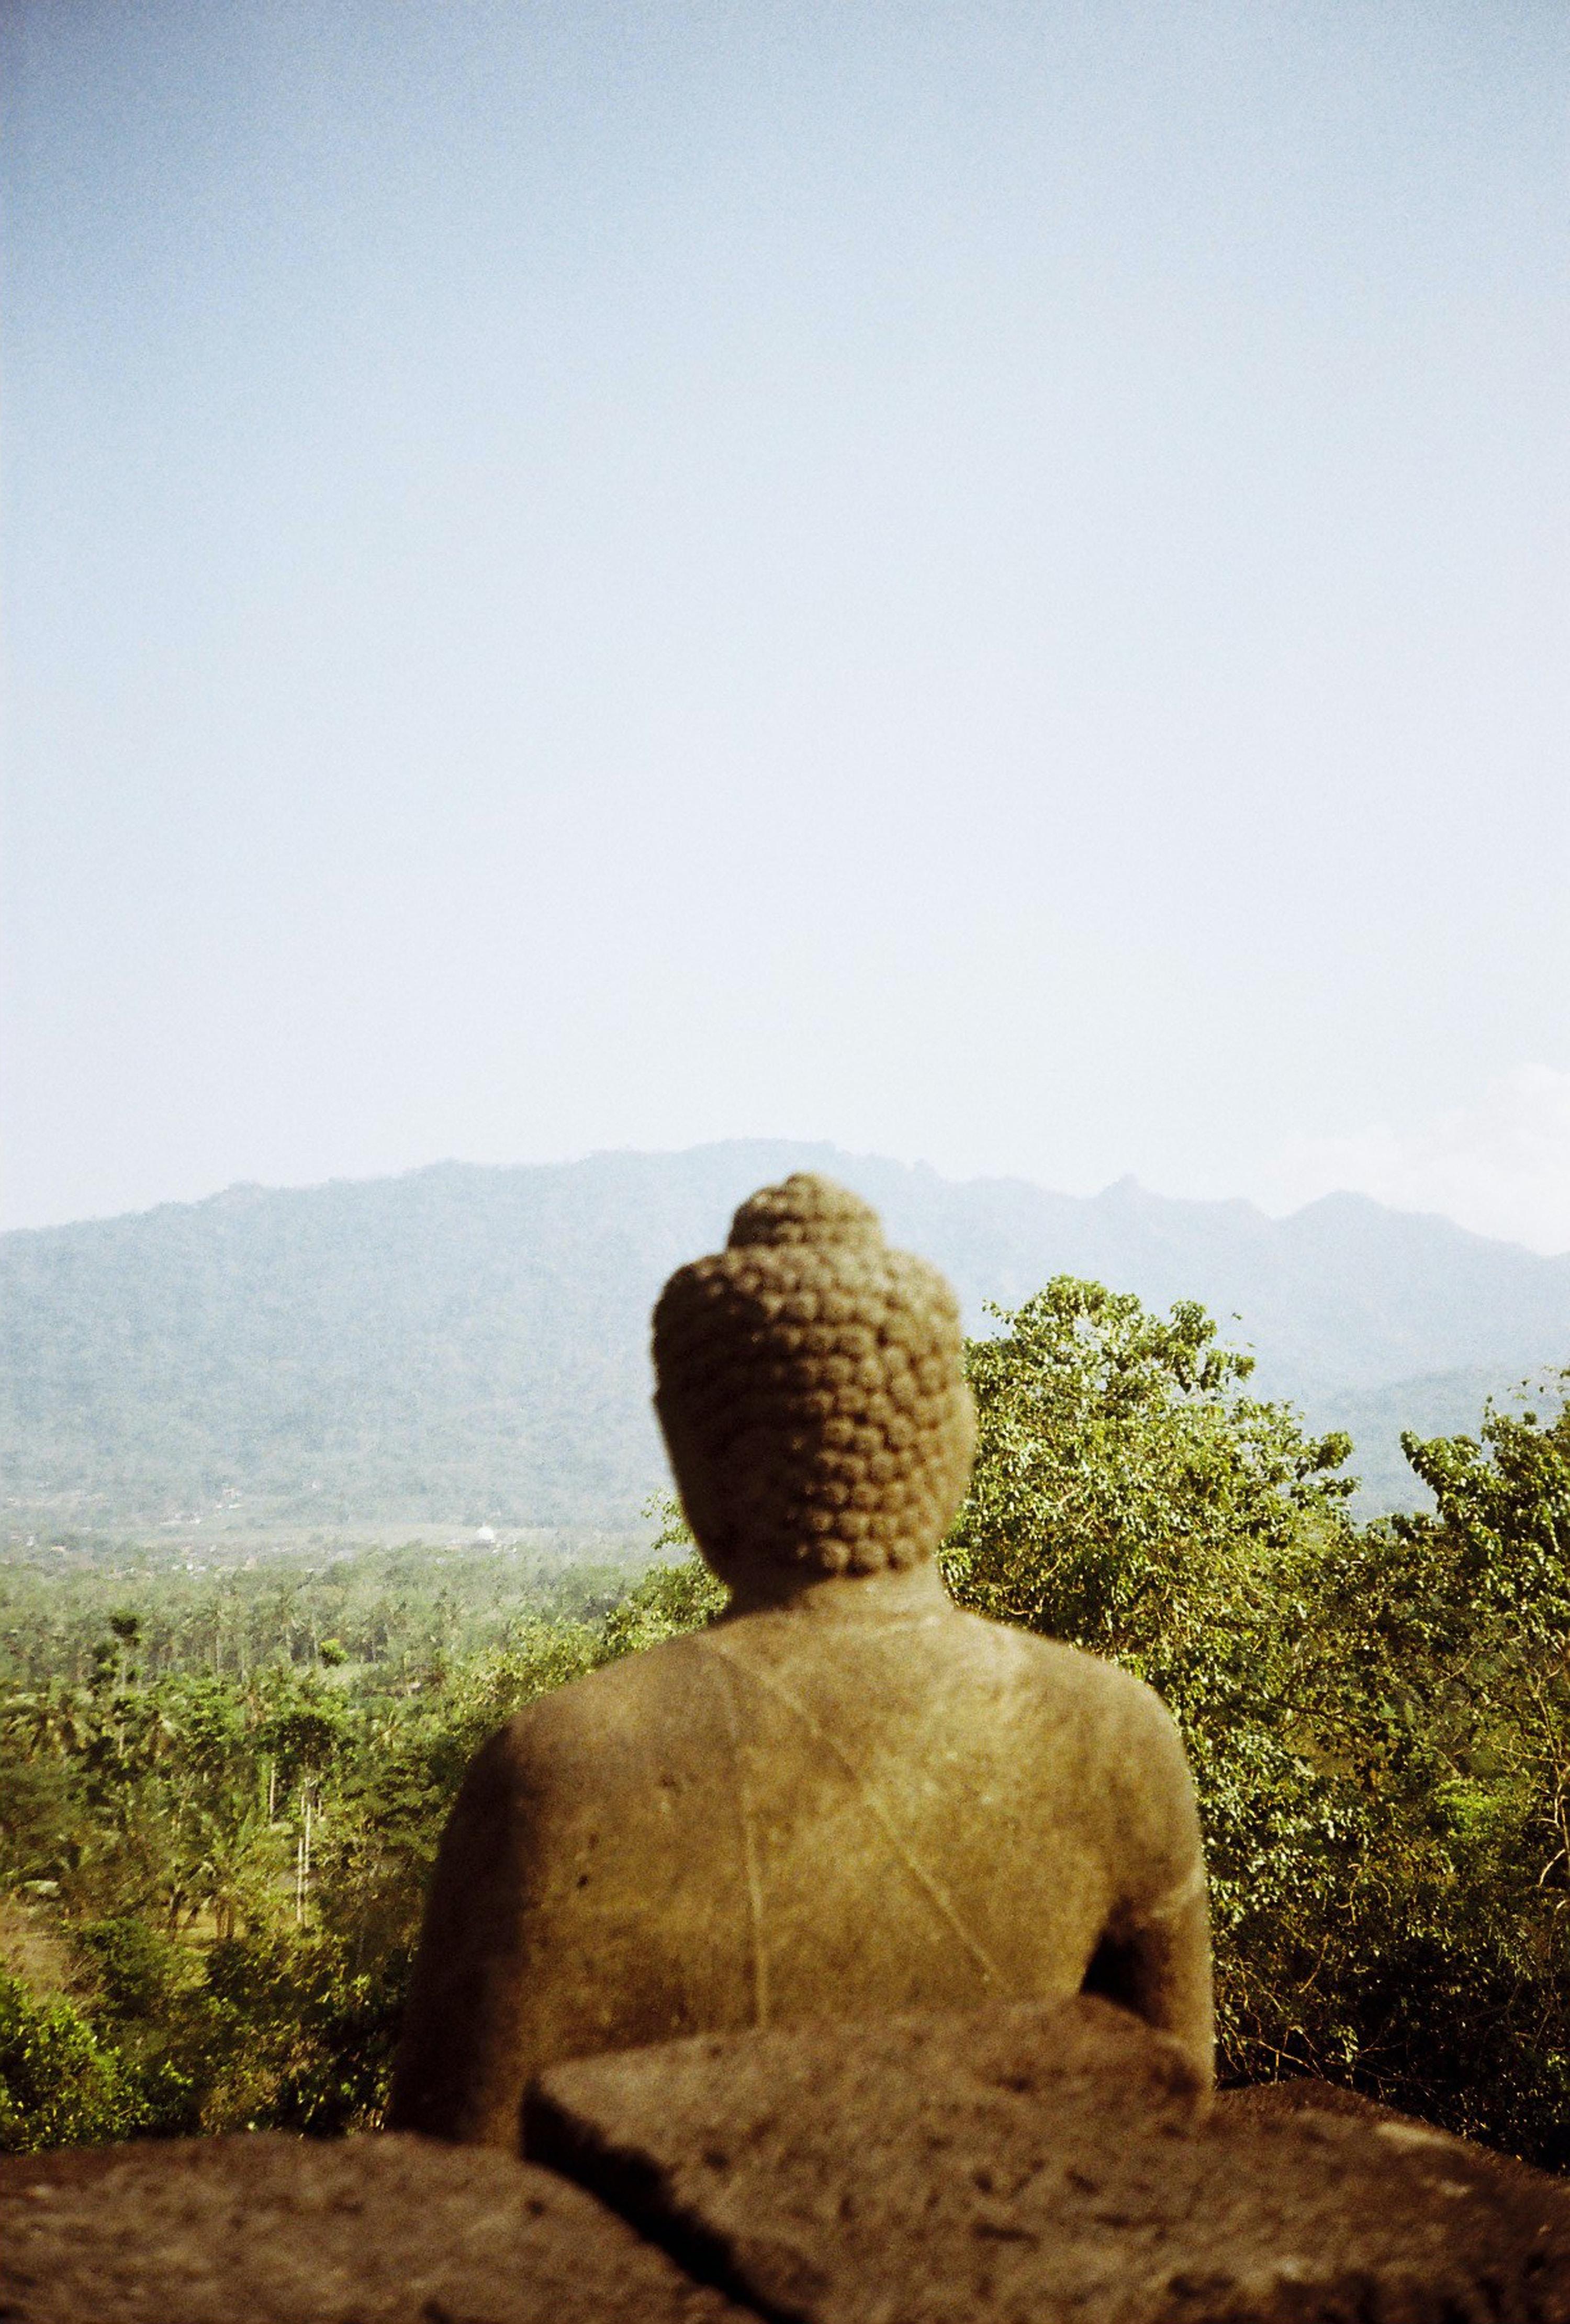 gray concrete Buddha statue near green leaf trees